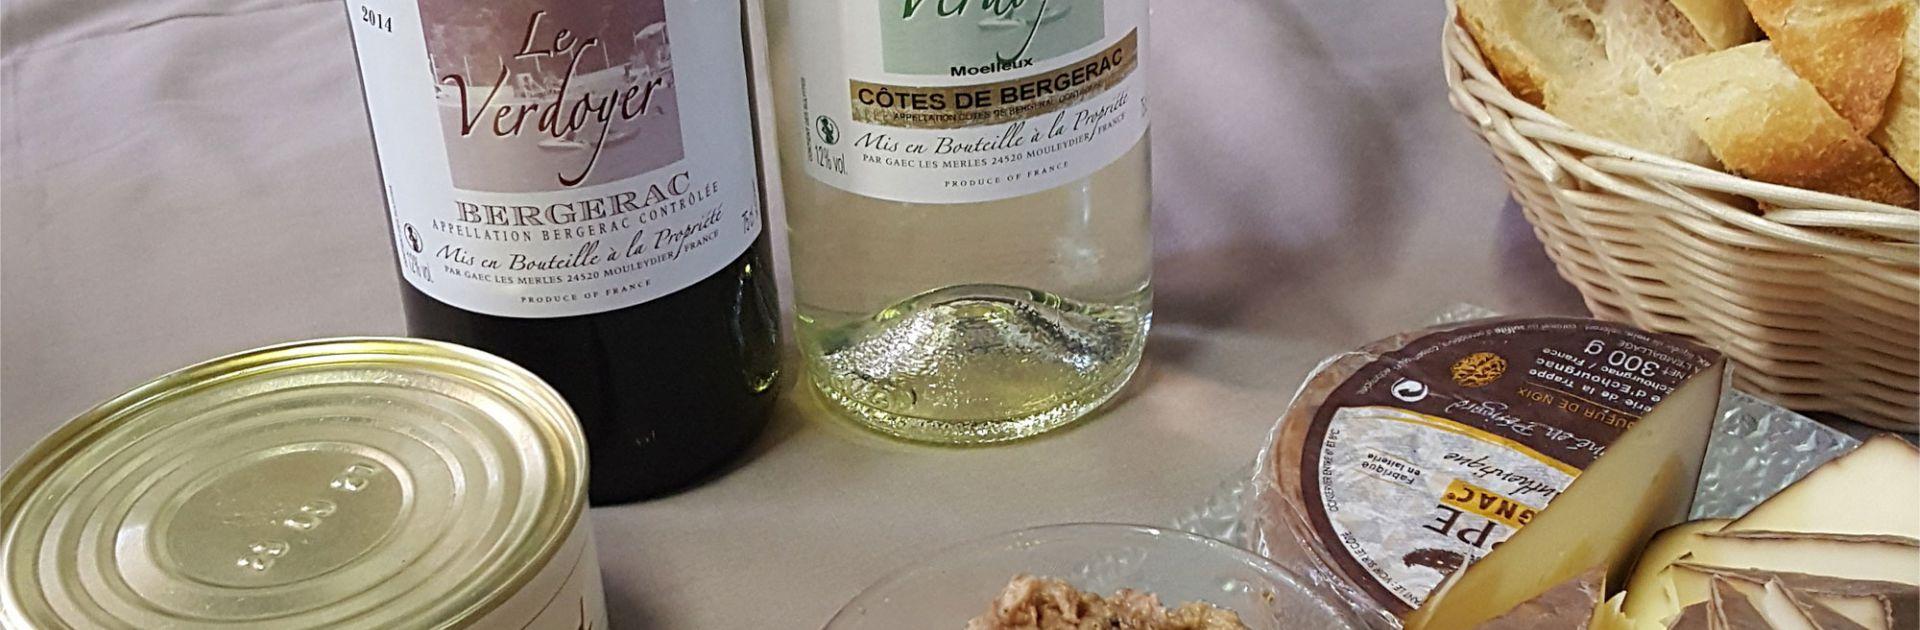 Producteurs Périgord Limousin